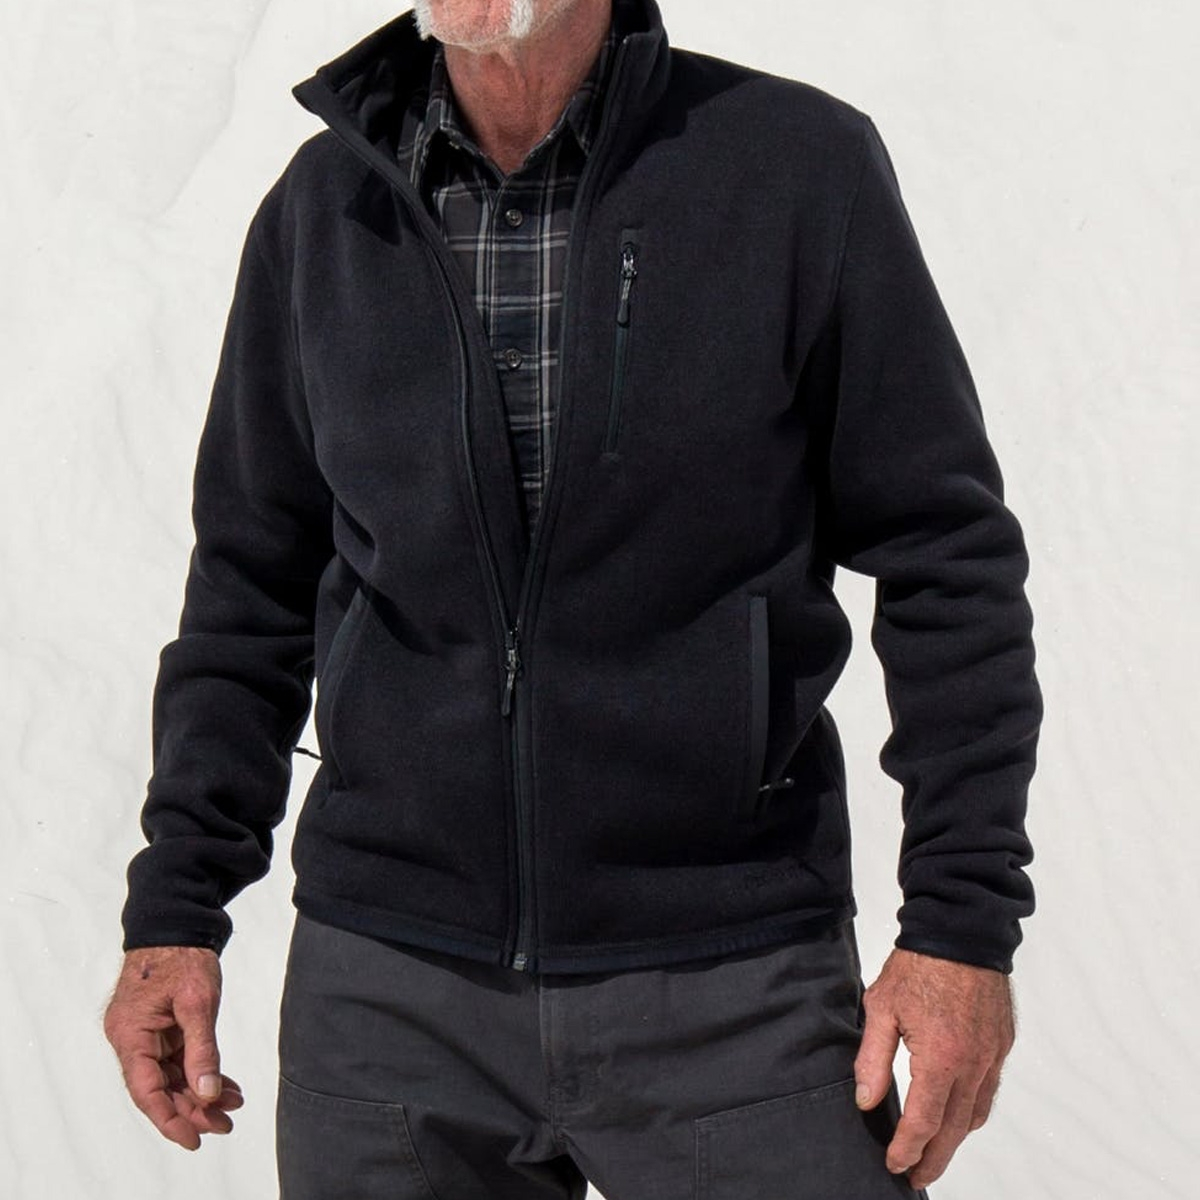 Filson Ridgeway Fleece Jacket Black, comfortable, lightweight quick-drying Polartec® fleece for use in extreme conditions